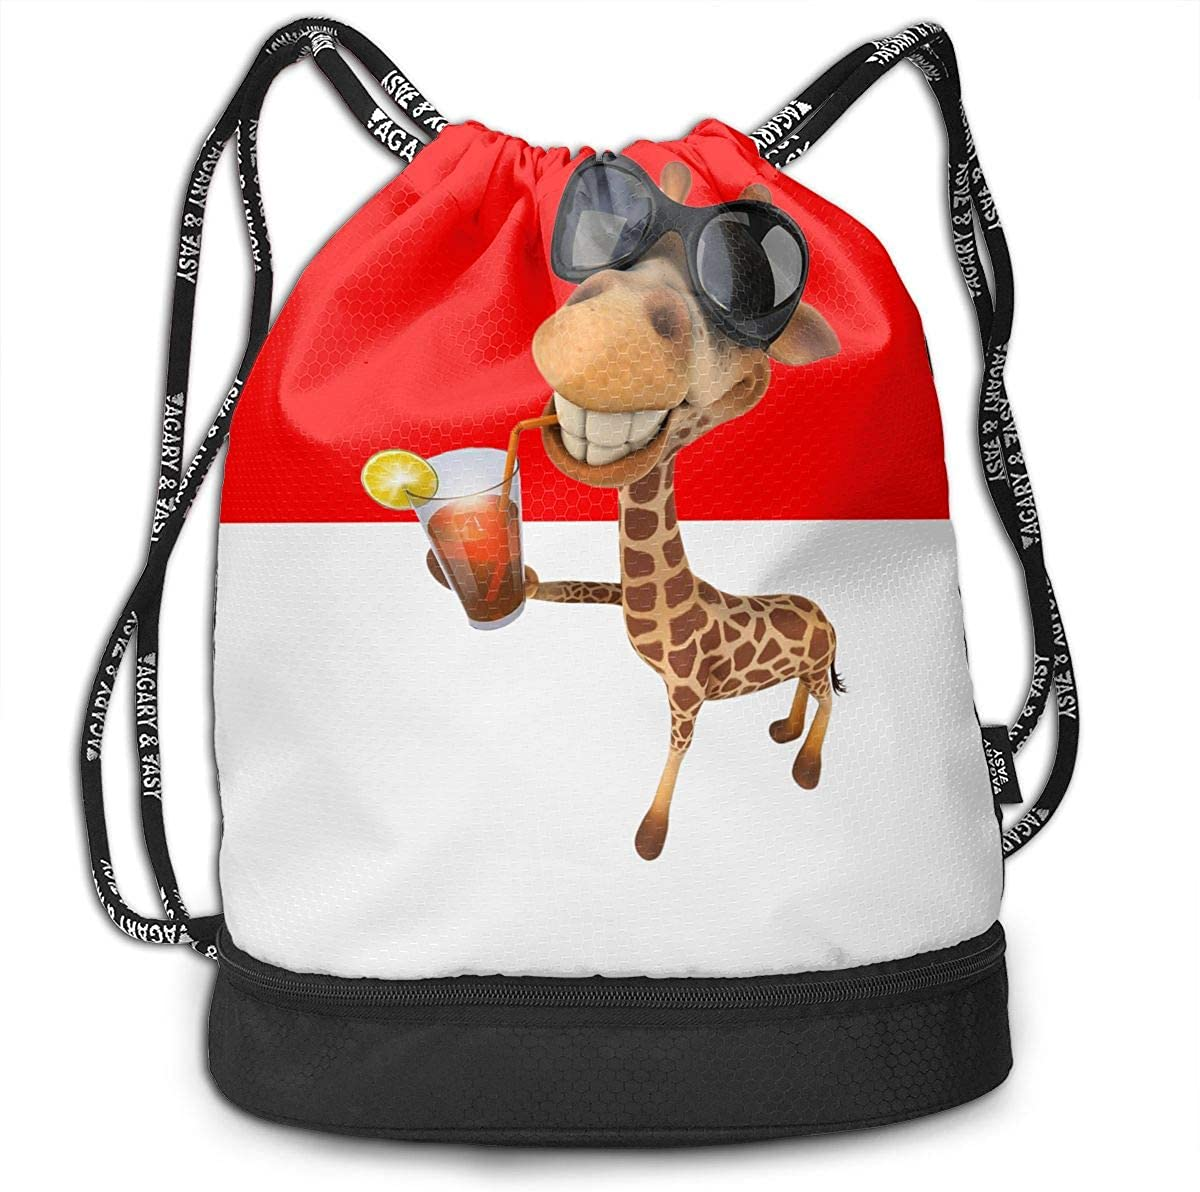 Giraffe Drawstring Backpack Rucksack Shoulder Bags Training Gym Sack For Man And Women